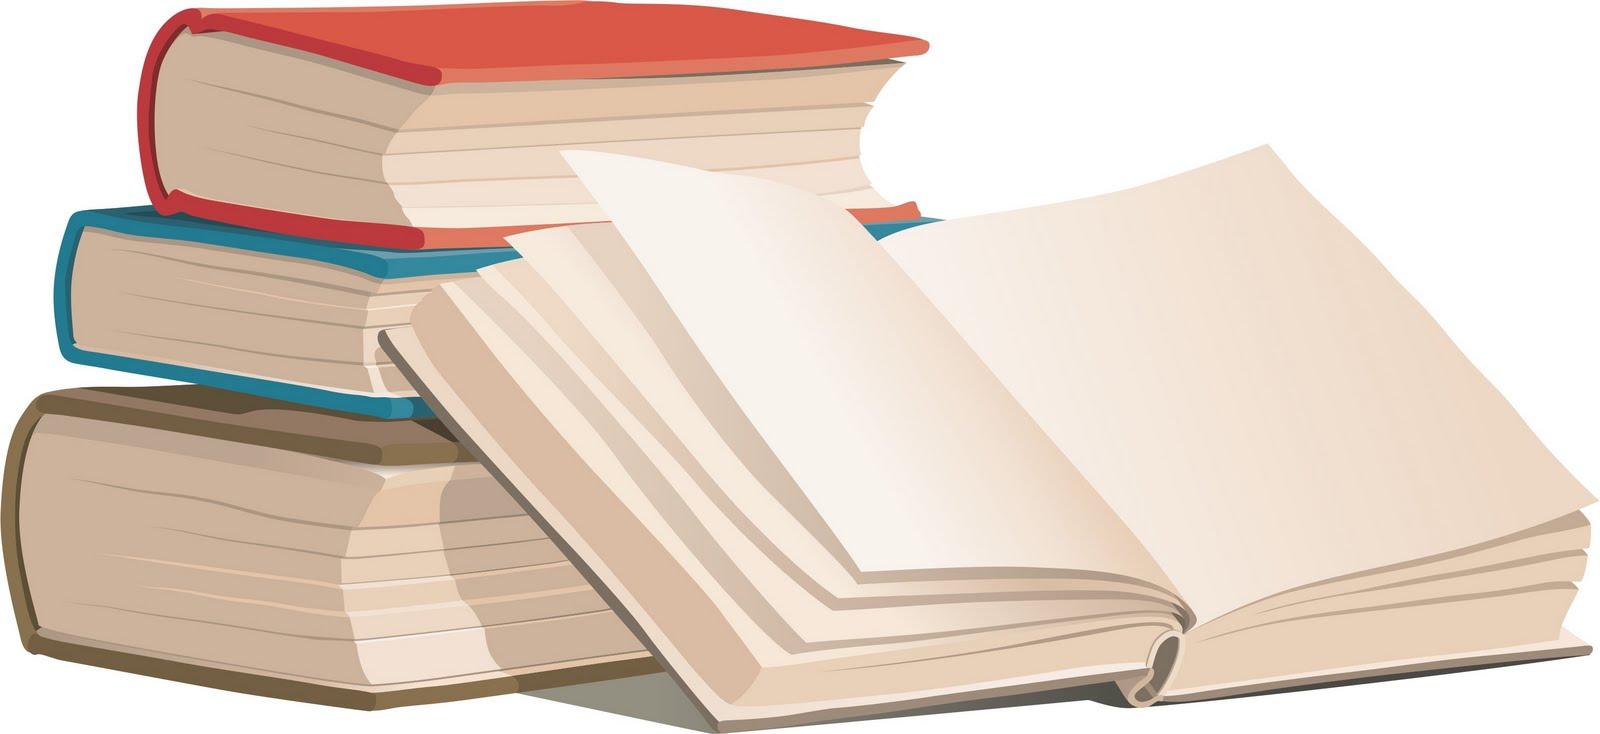 Rangkuman Materi Uasbn Pelajaran Ipa Download Silabus Dan Rpp